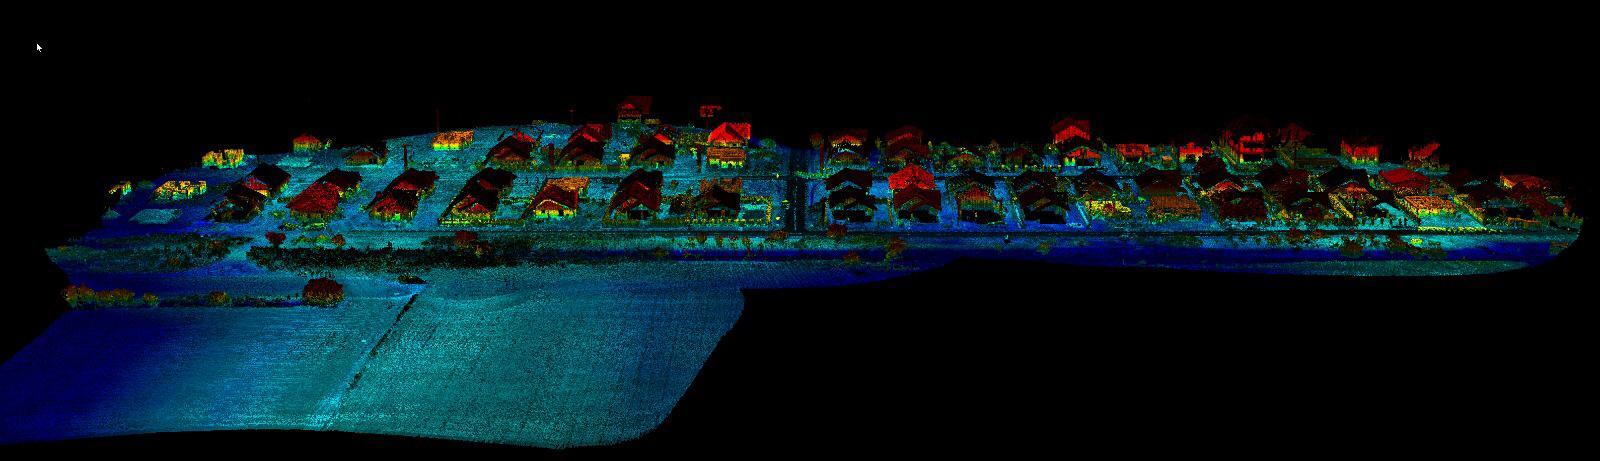 nor de puncte scanare 3d sistem lidar dronezone drona